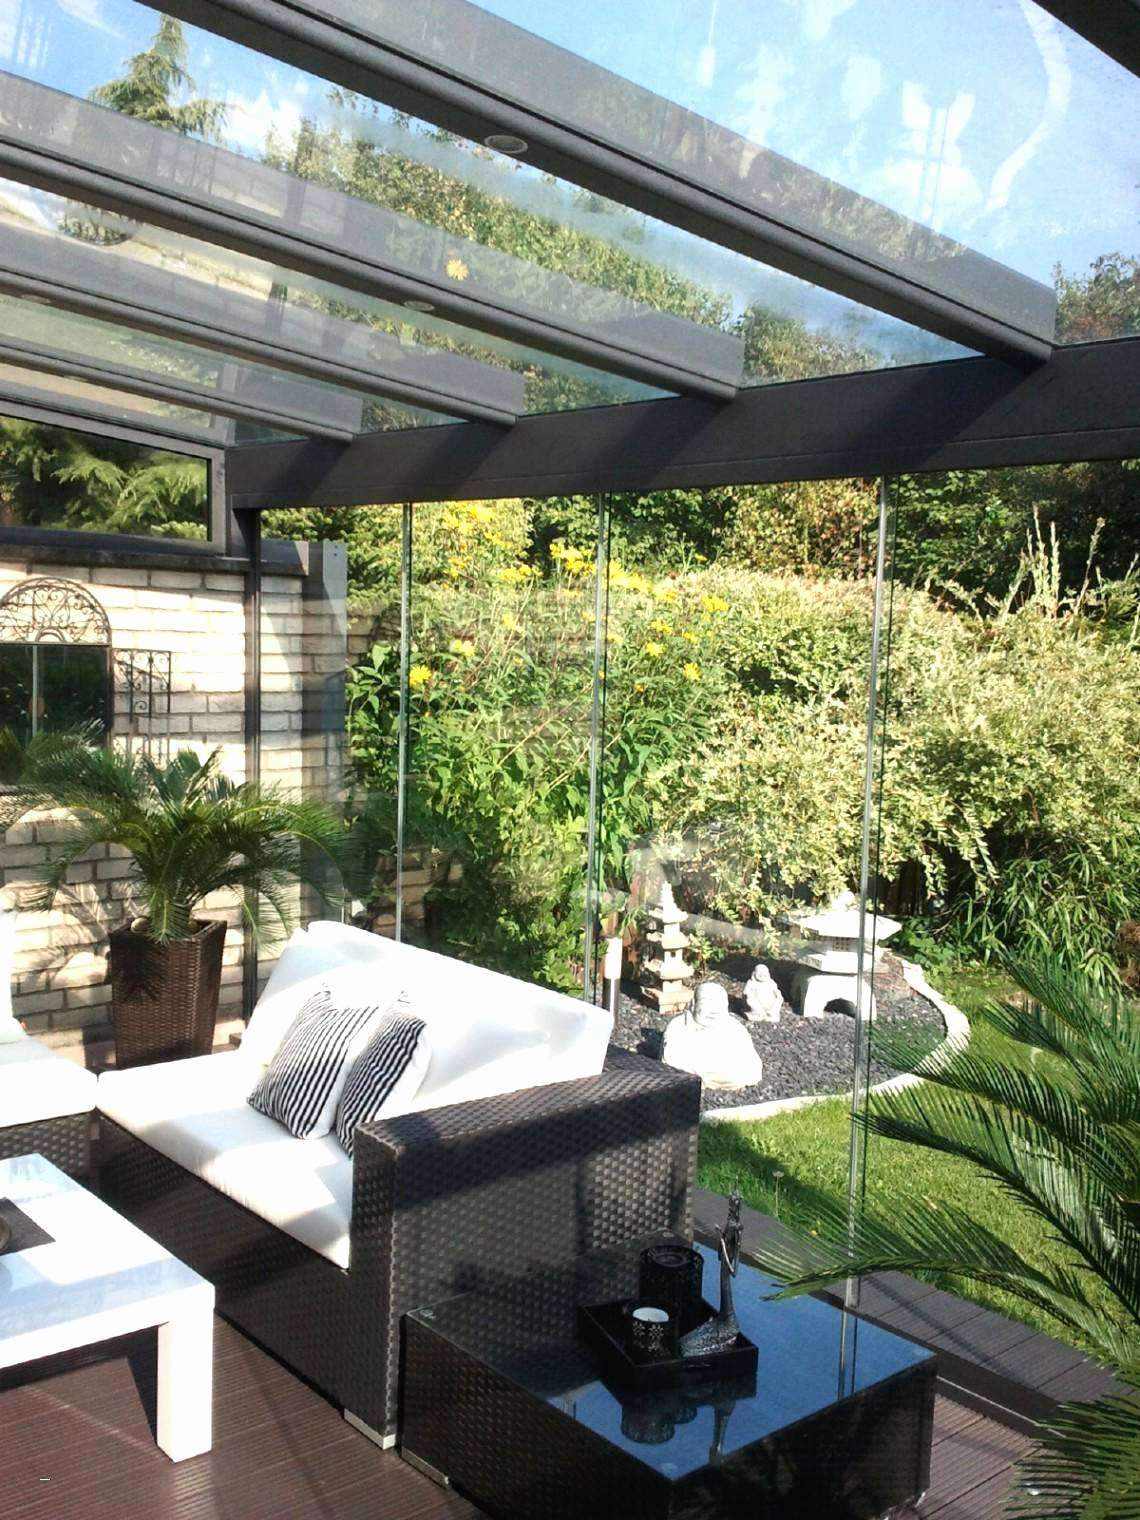 garten terrassen ideen luxus kleingarten gestalten ideen of garten terrassen ideen